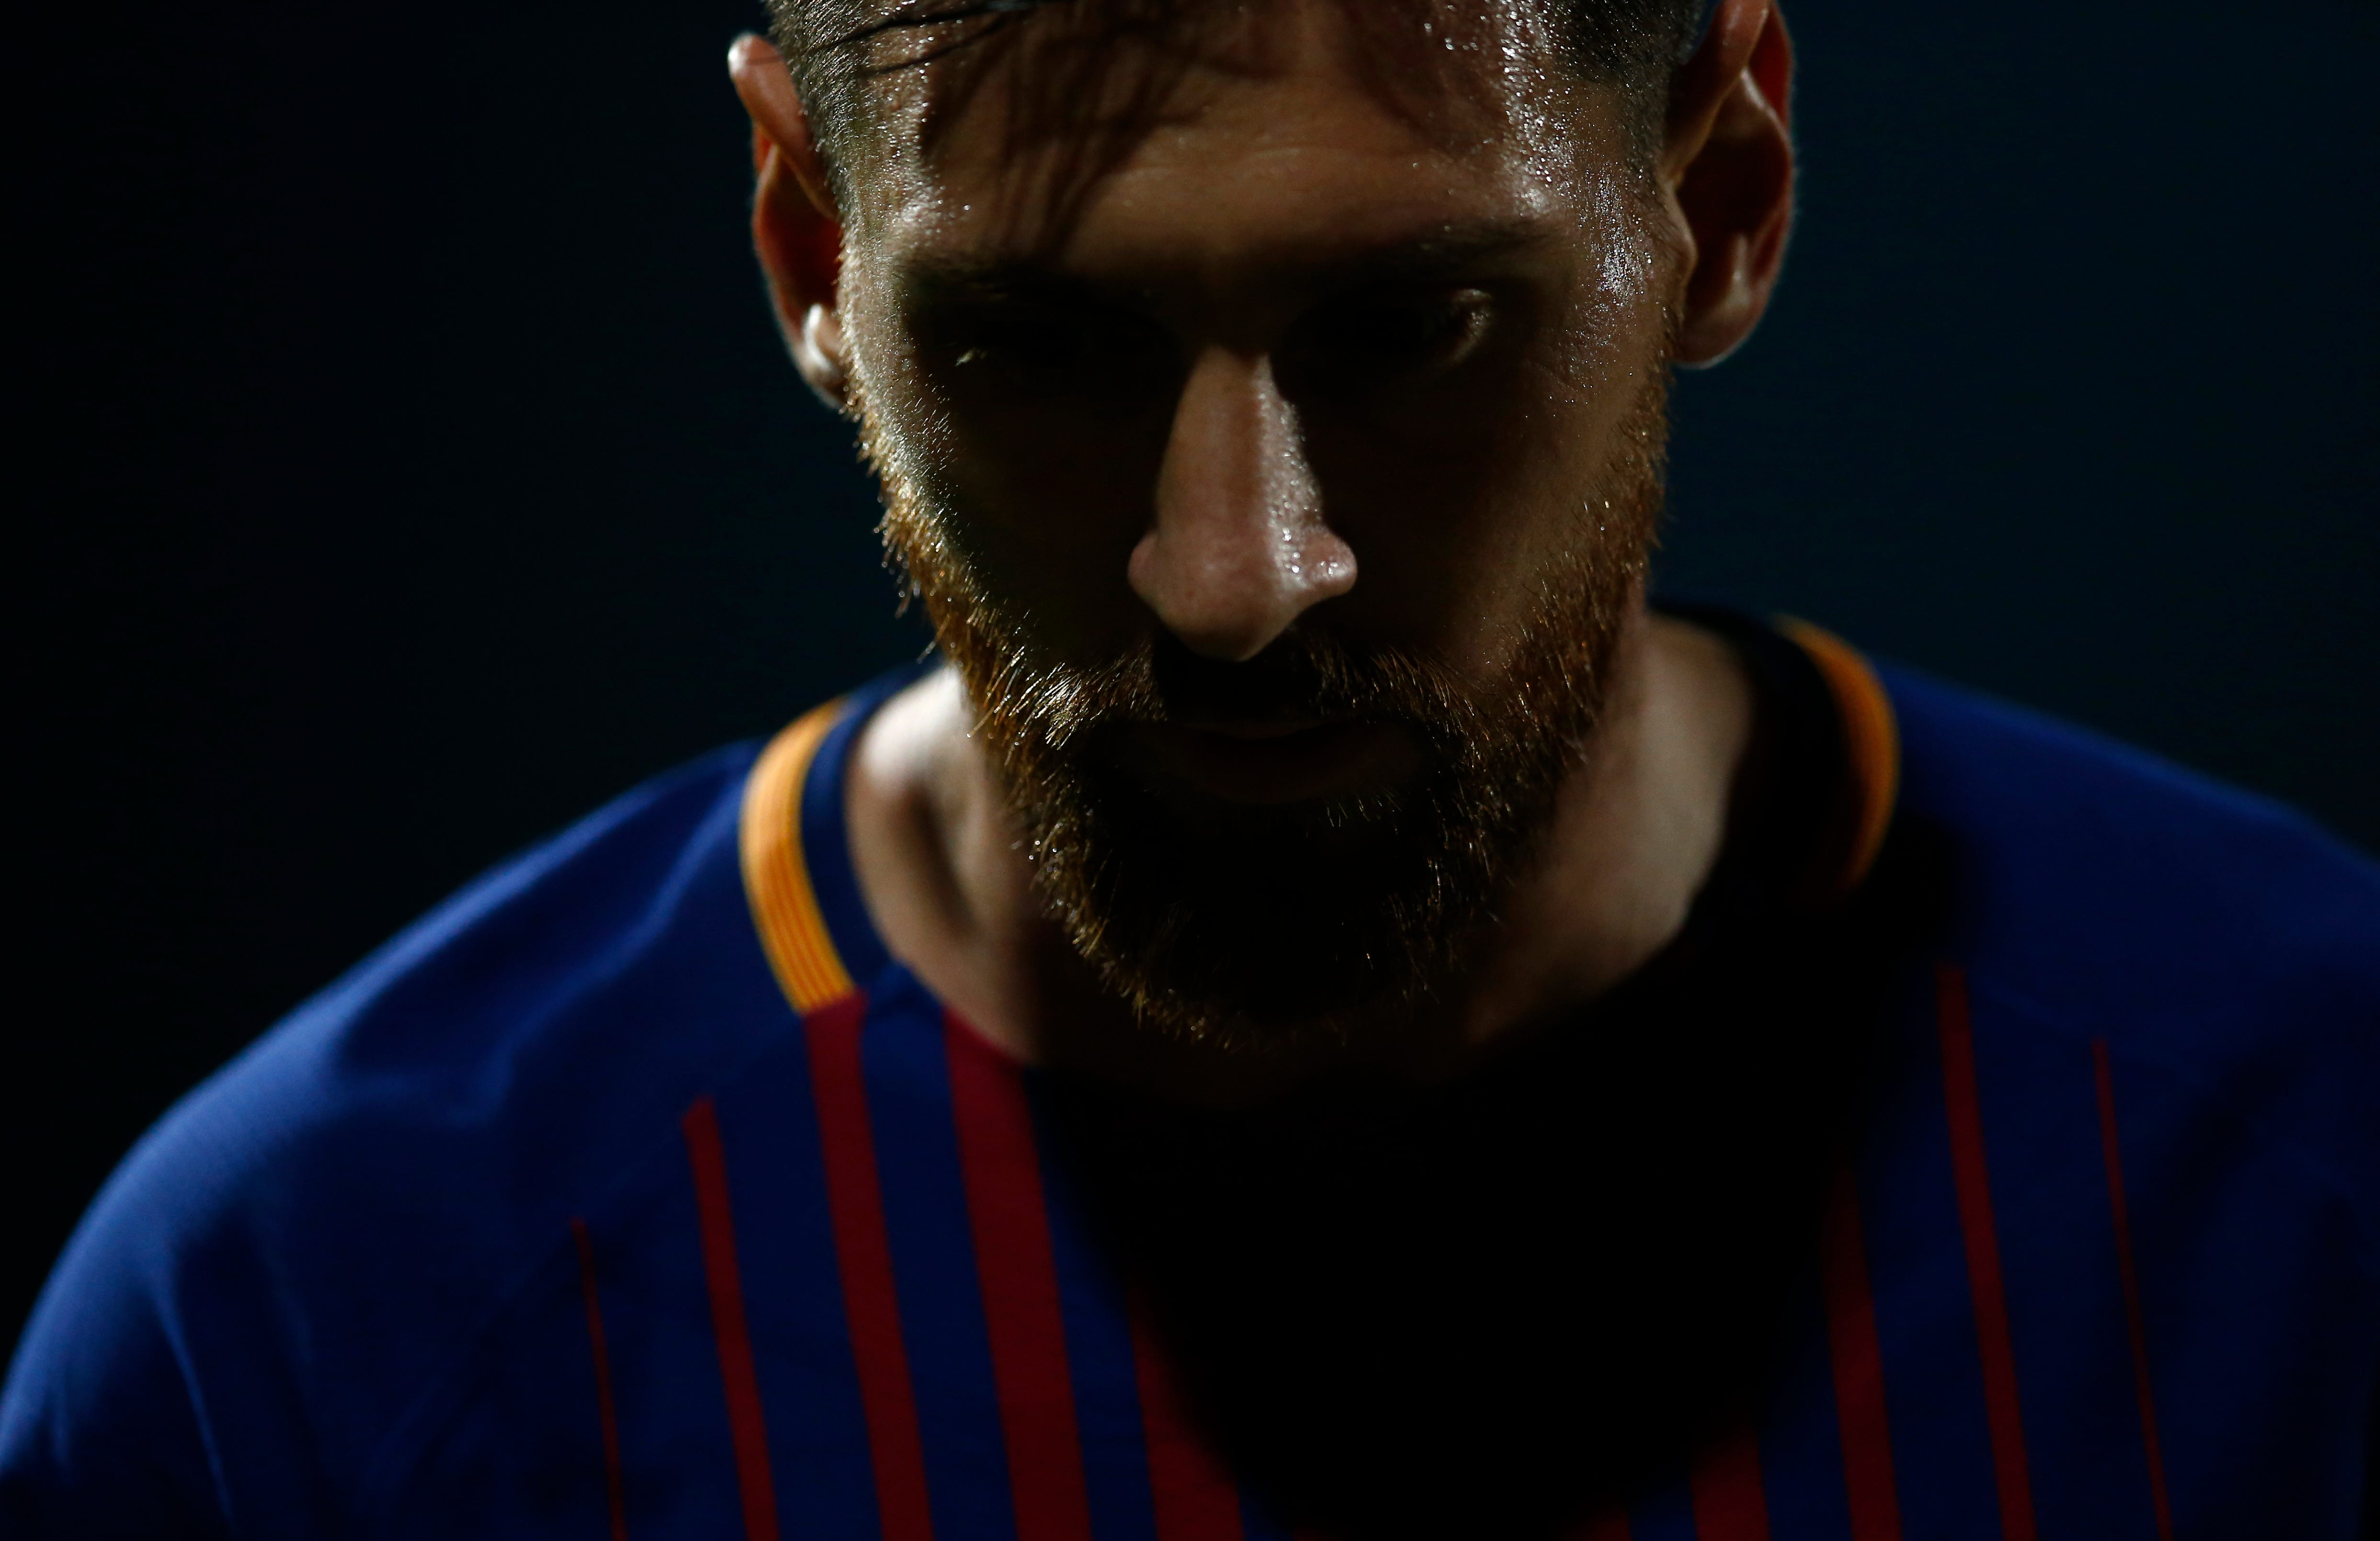 Own goals help Barcelona win 3-0 at Girona to increase lead